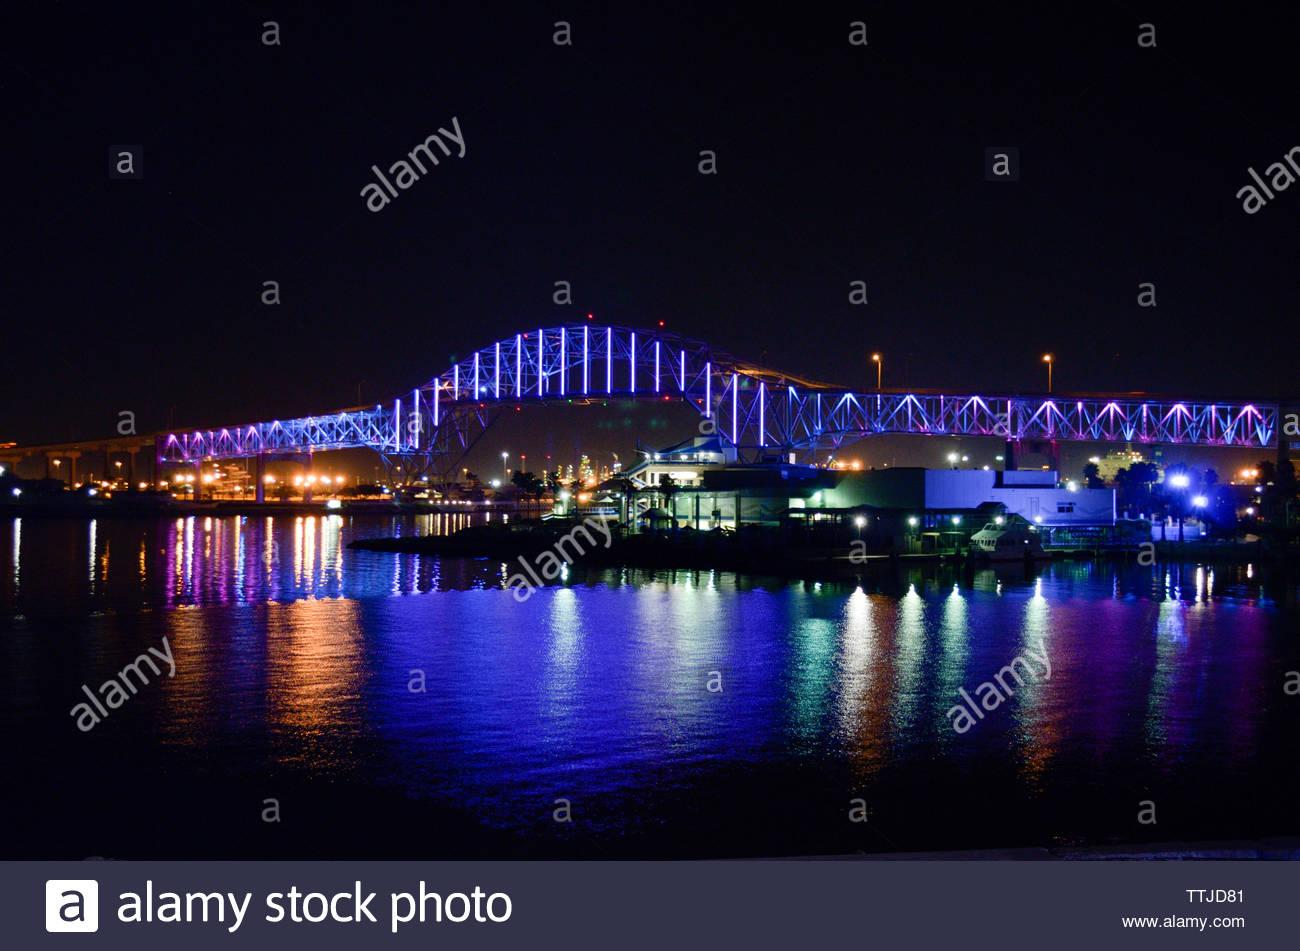 Bridge at night. Bridge lit up at night. Corpus Christi Harbor Bridge at Night. LED lighting. LED lighting on bridge. Colorful LED Lighting. Colourful - Stock Image